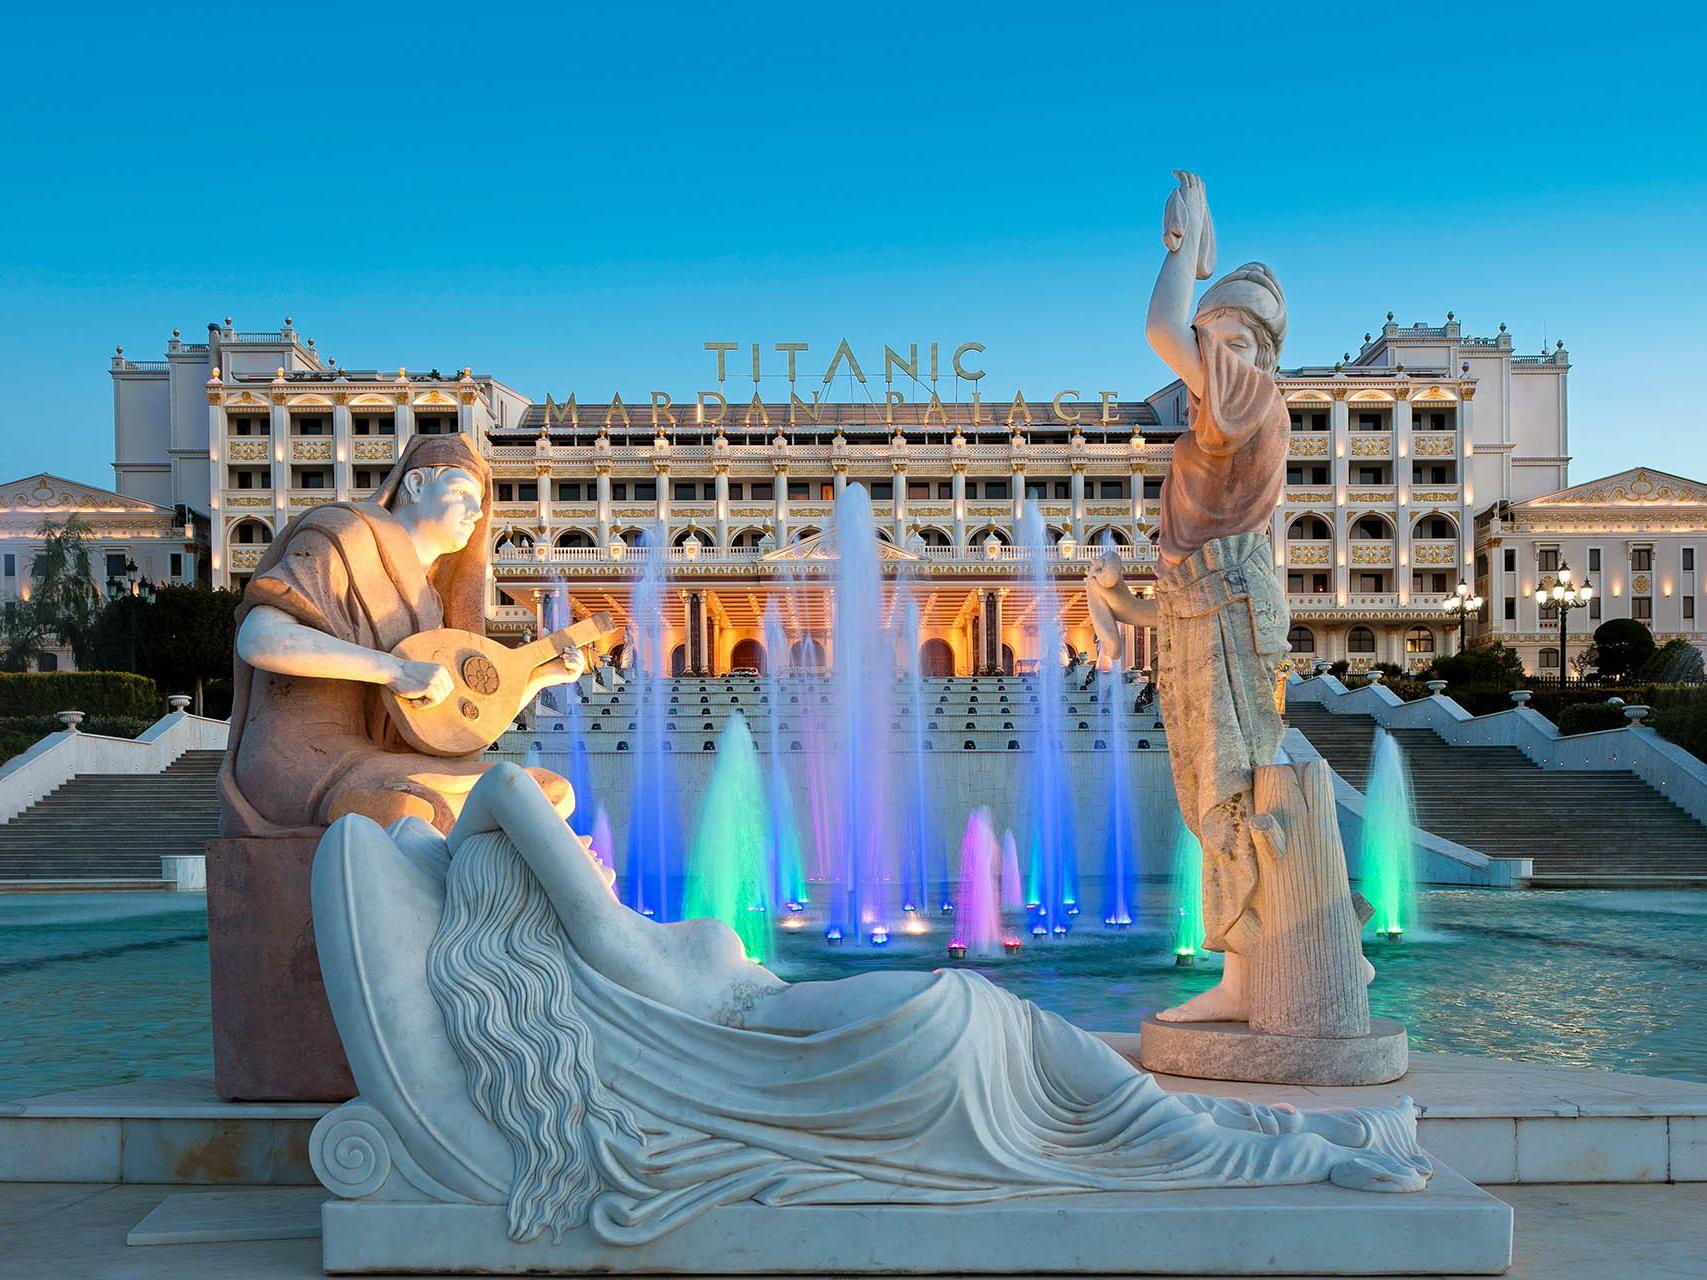 5 Star All Inclusive Antalya Turkey Titanic Mardan Palace Photo Tour How To Take Photos Antalya